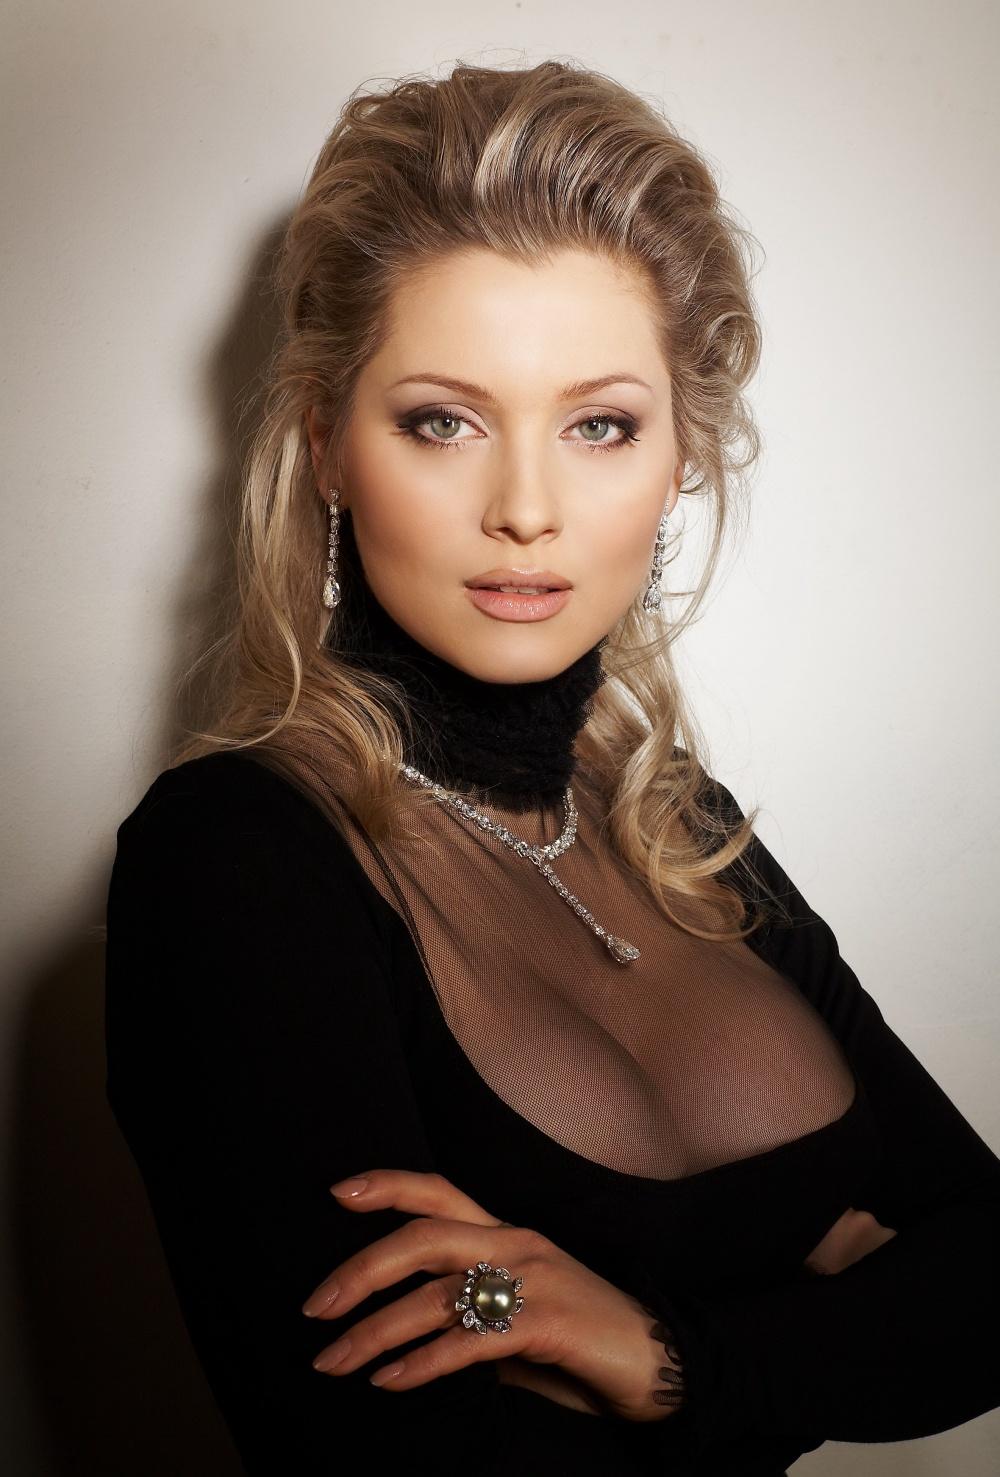 Голая певица ведущая Лена Ленина фото эротика картинки